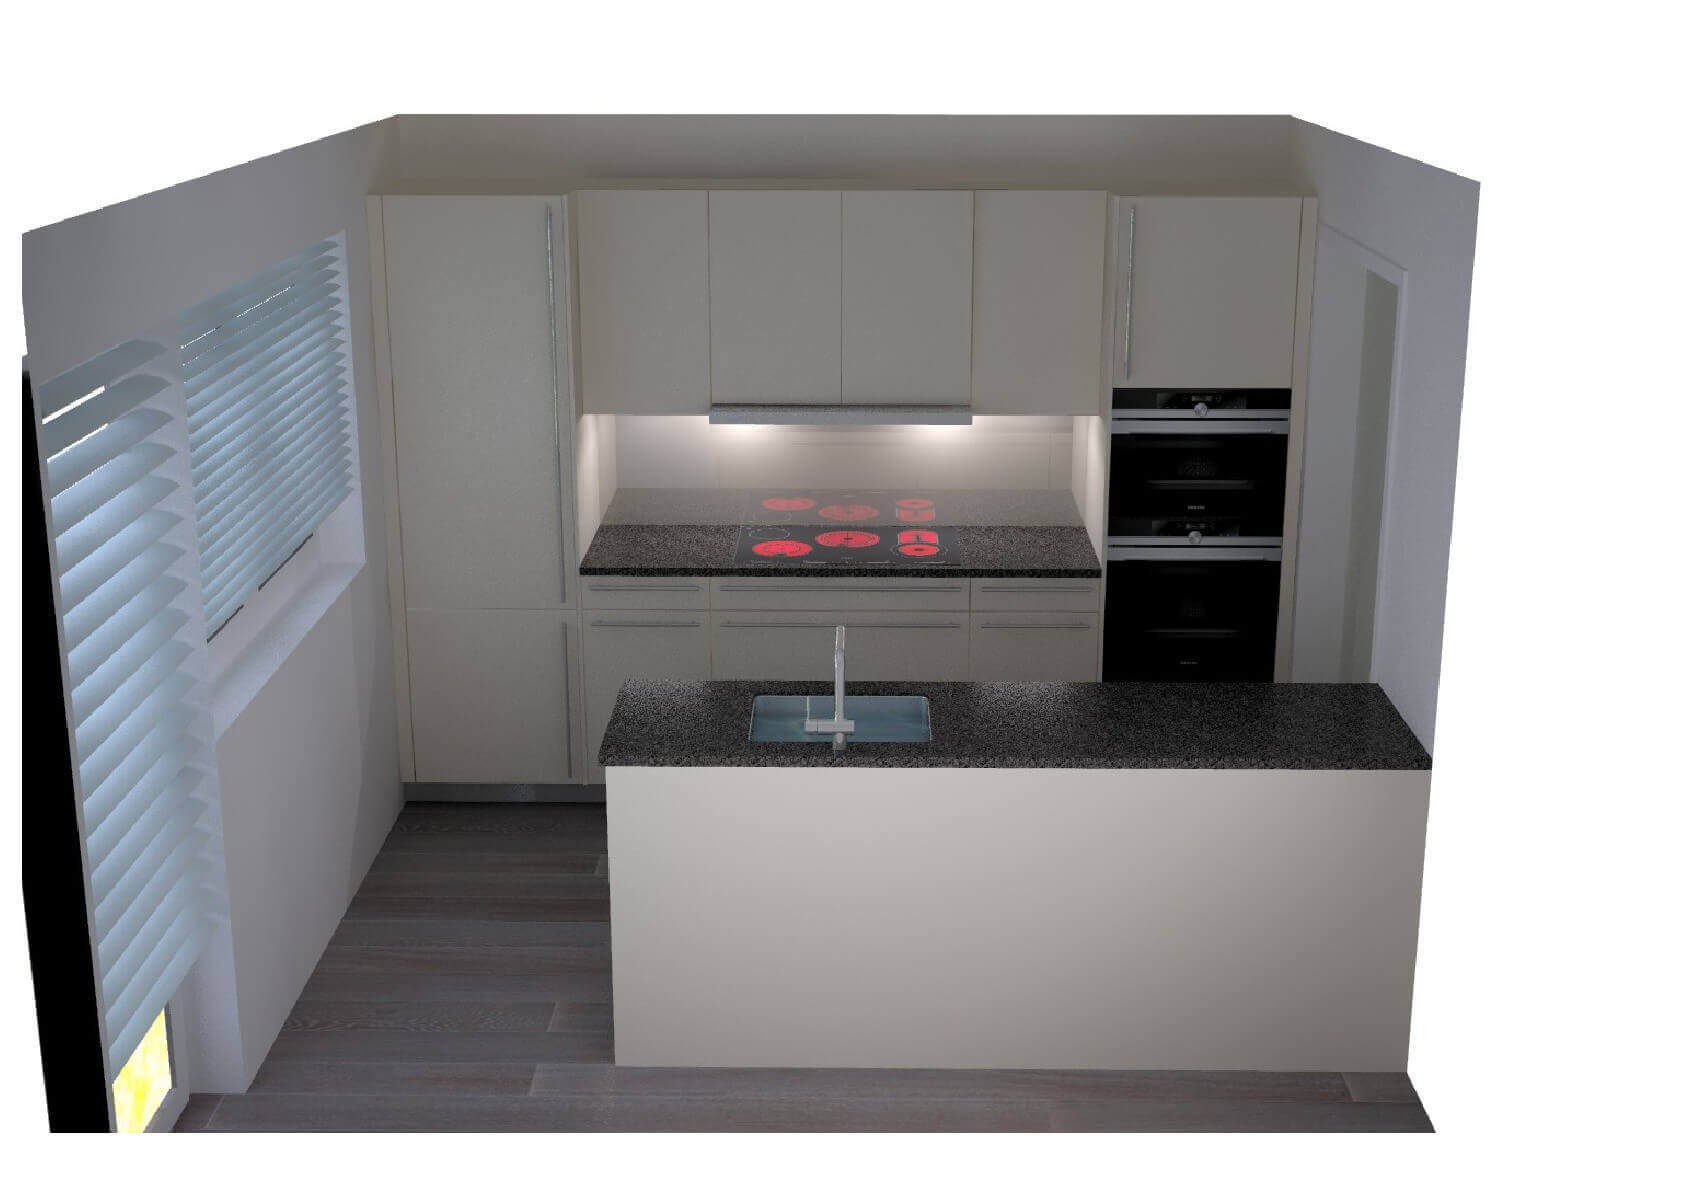 Full Size of Küche Ohne Elektrogeräte Kaufen Ikea Küche Ohne Elektrogeräte Küche Ohne Elektrogeräte Gebraucht Küche Ohne Elektrogeräte Günstig Kaufen Küche Küche Ohne Elektrogeräte